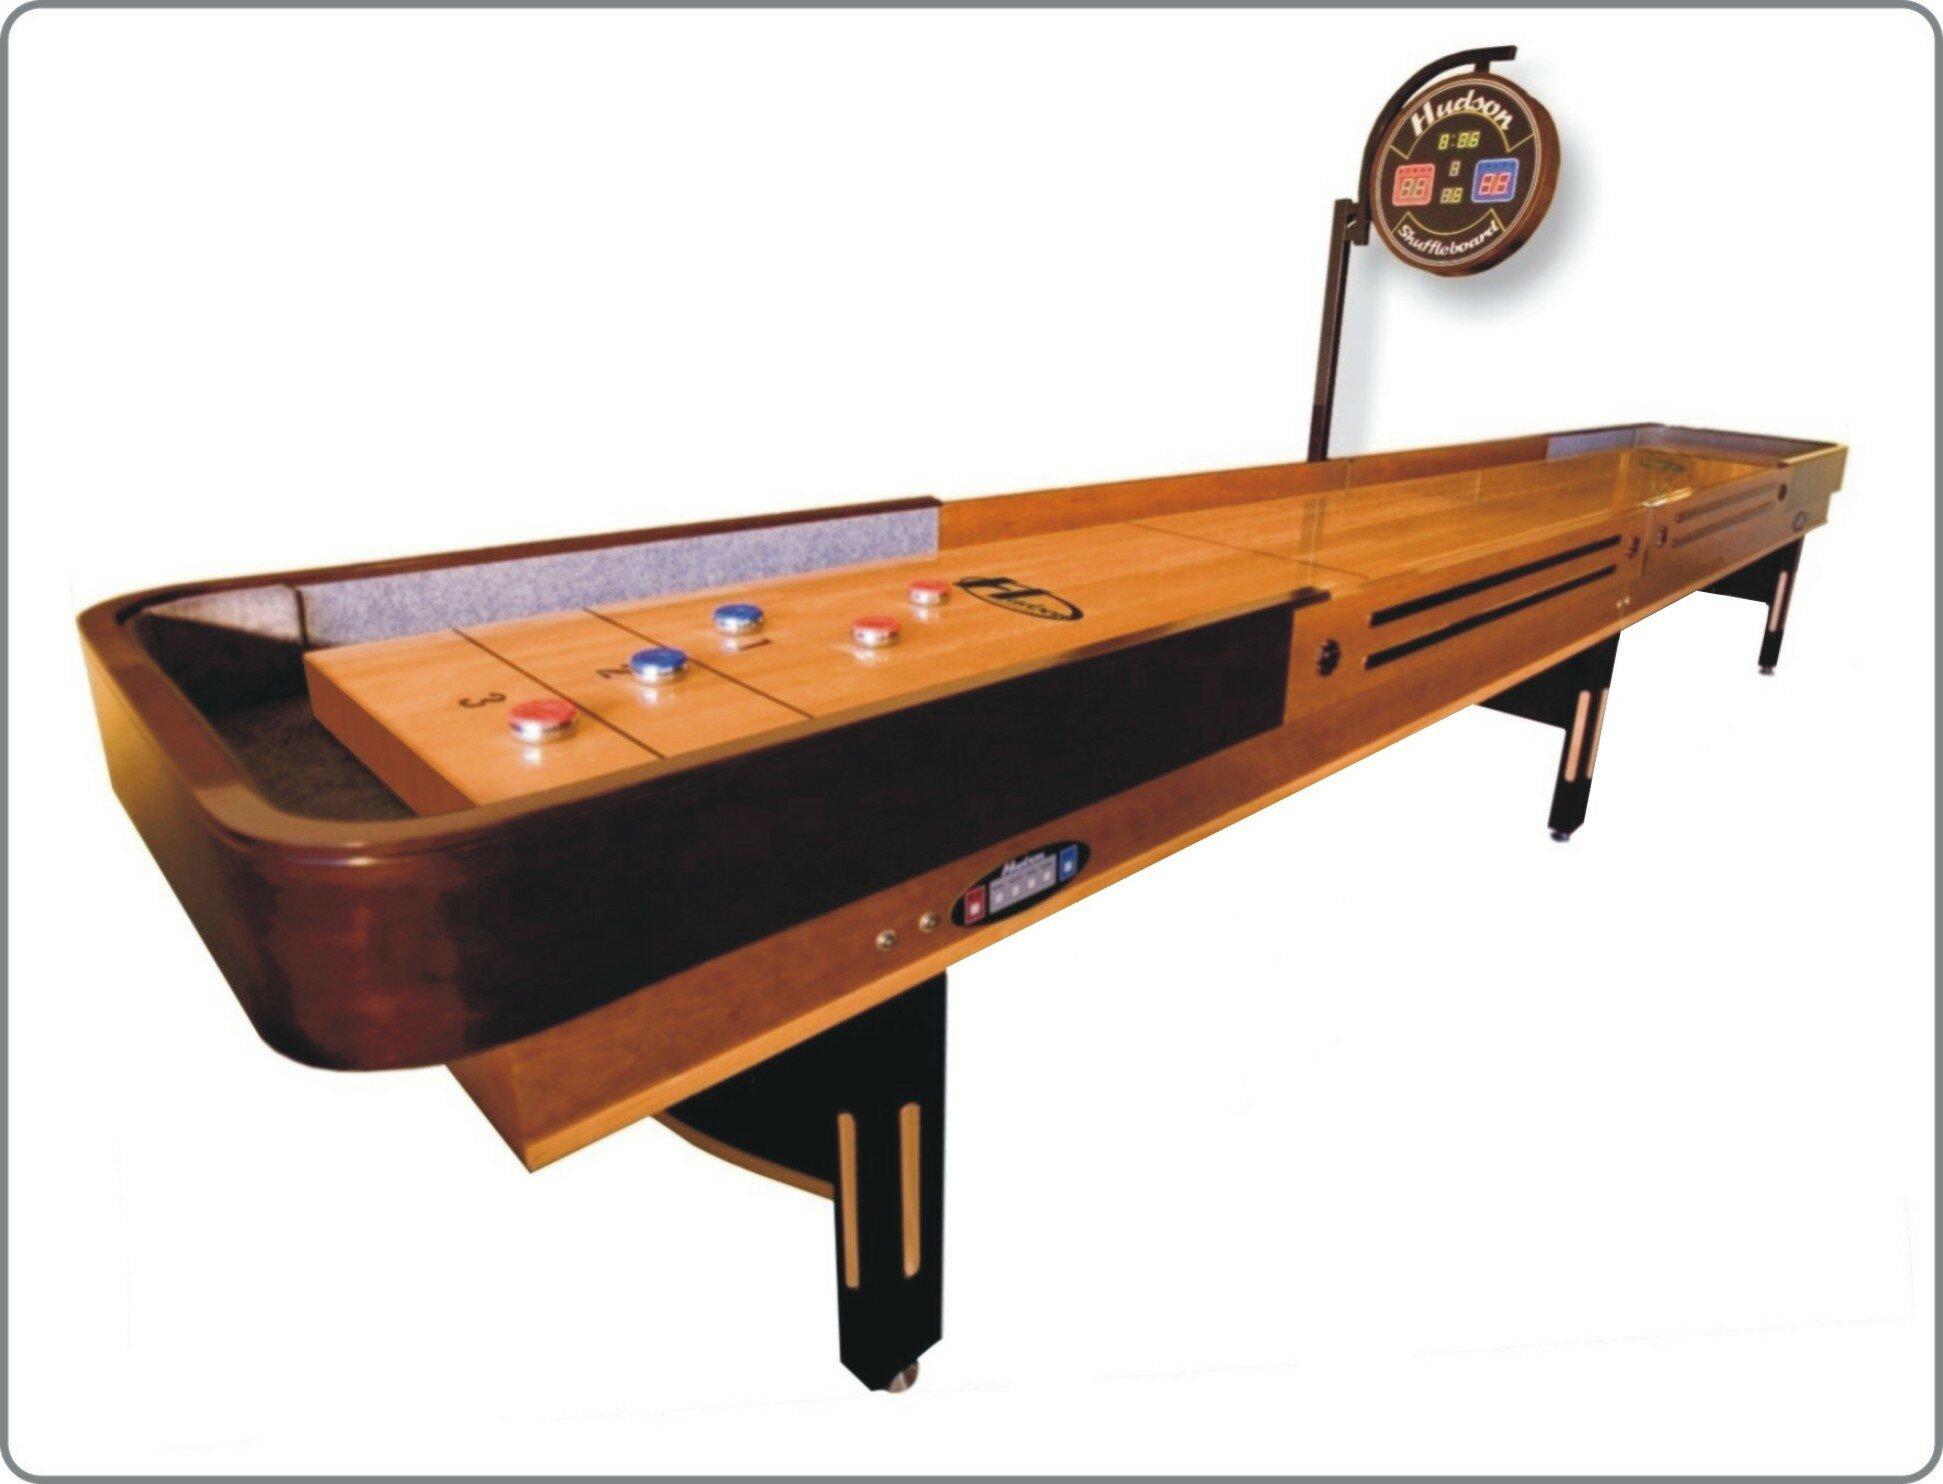 u shuffle sale boutique for cave rail marines board products shuffleboard side table man corvette logo usmc s